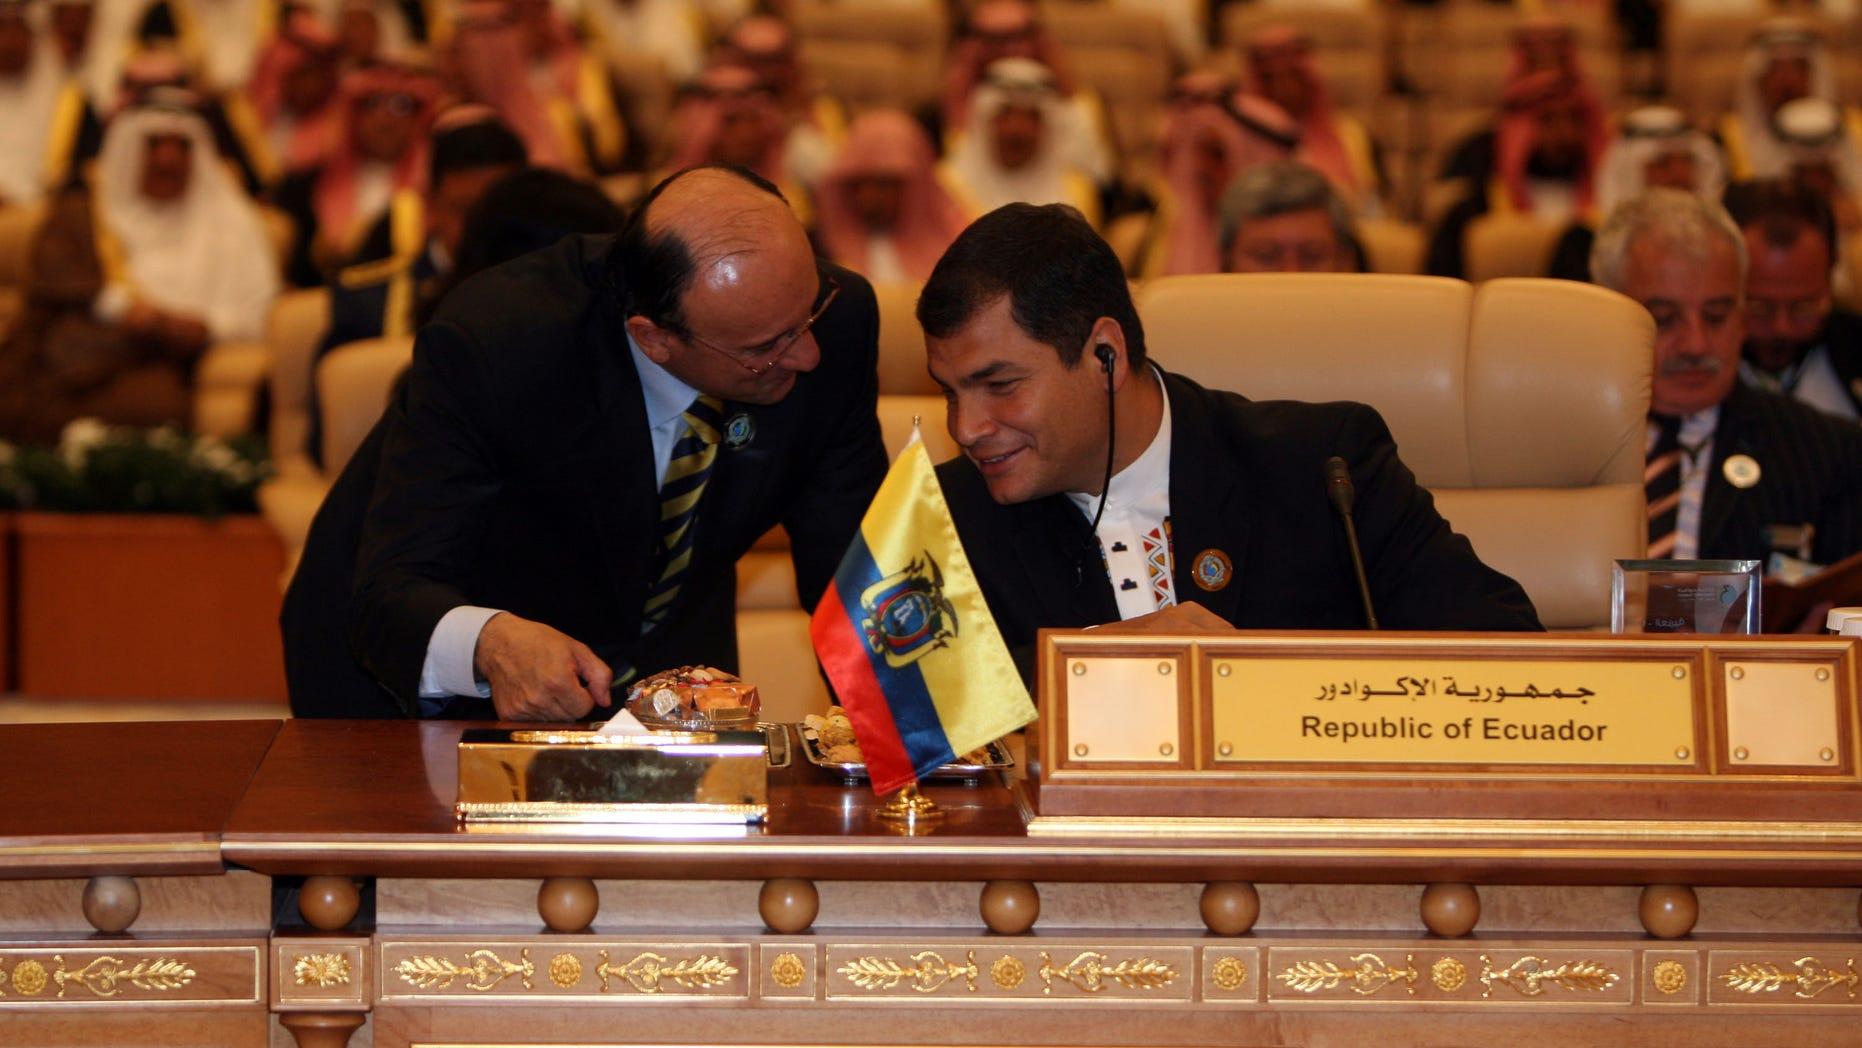 RIYADH, SAUDI ARABIA- NOVEMBER17: Ecuador's president Rafael Correa attends the opening session of the third OPEC Summit on November 17, 2007 in Riyadh, Saudi Arabia. (Photo by Salah Malkawi/ Getty Images)